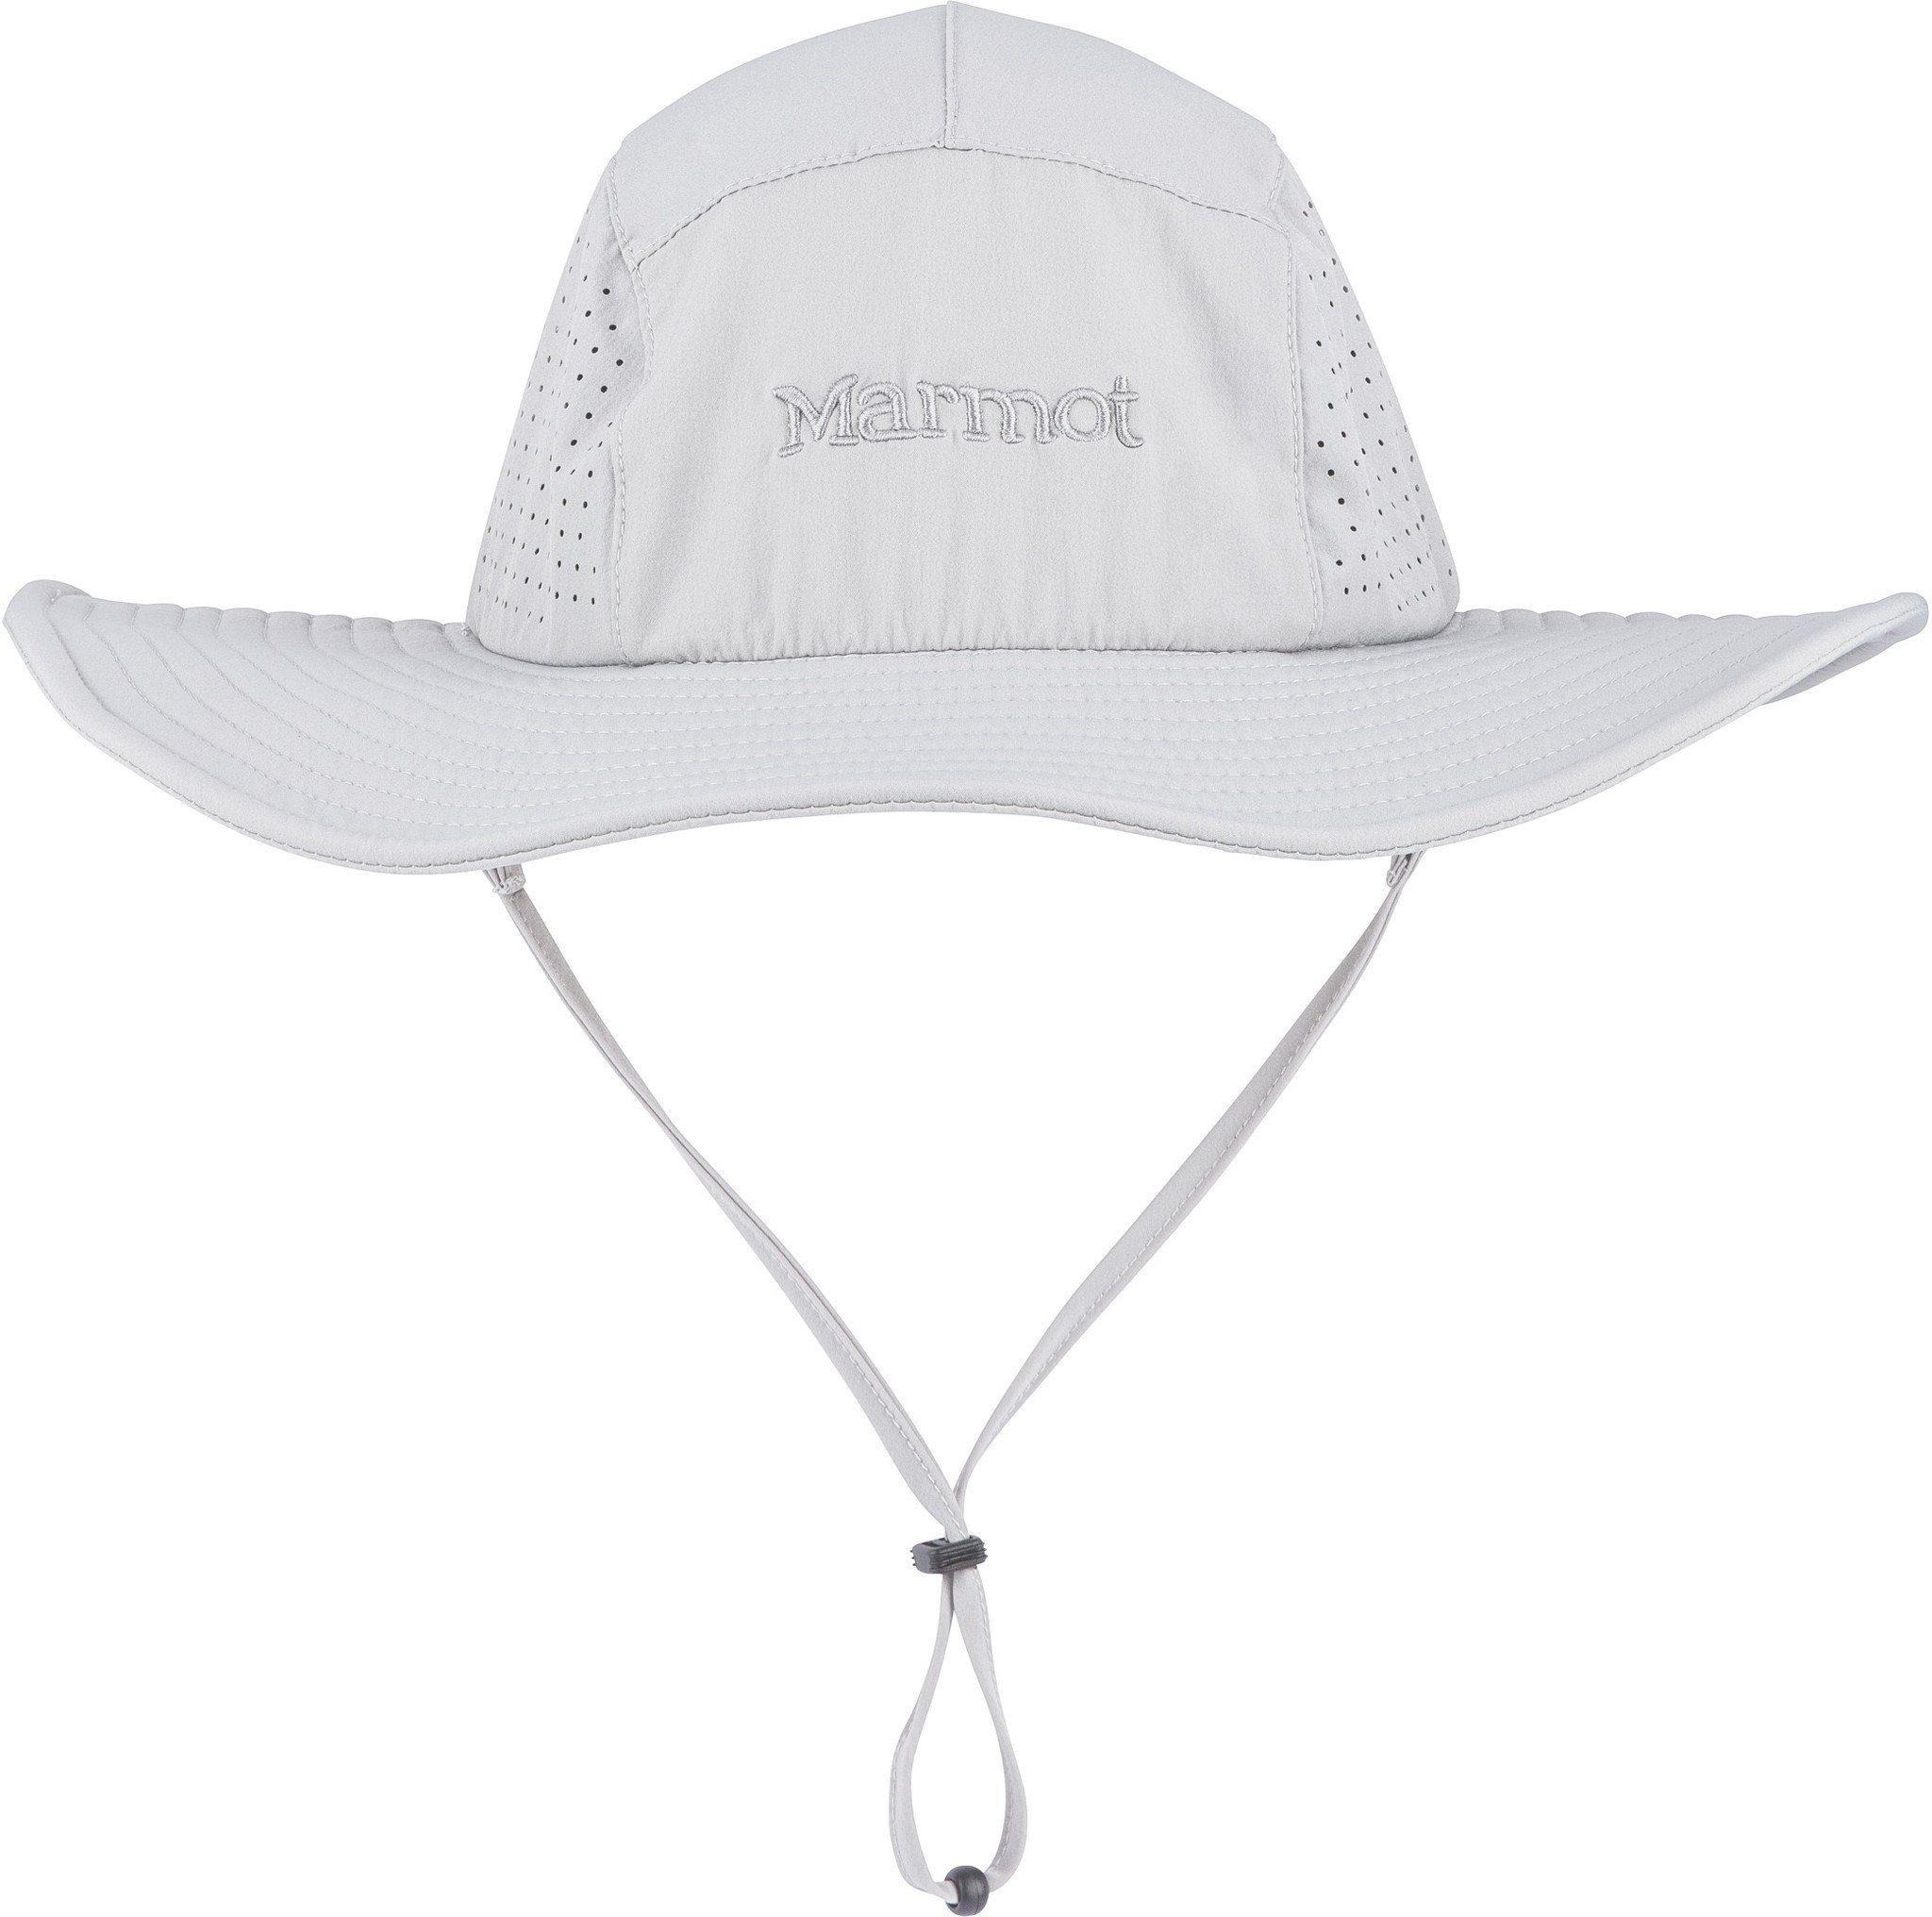 Hut Kaufen Online »breeze Hat« Marmot LSzMVGUjqp